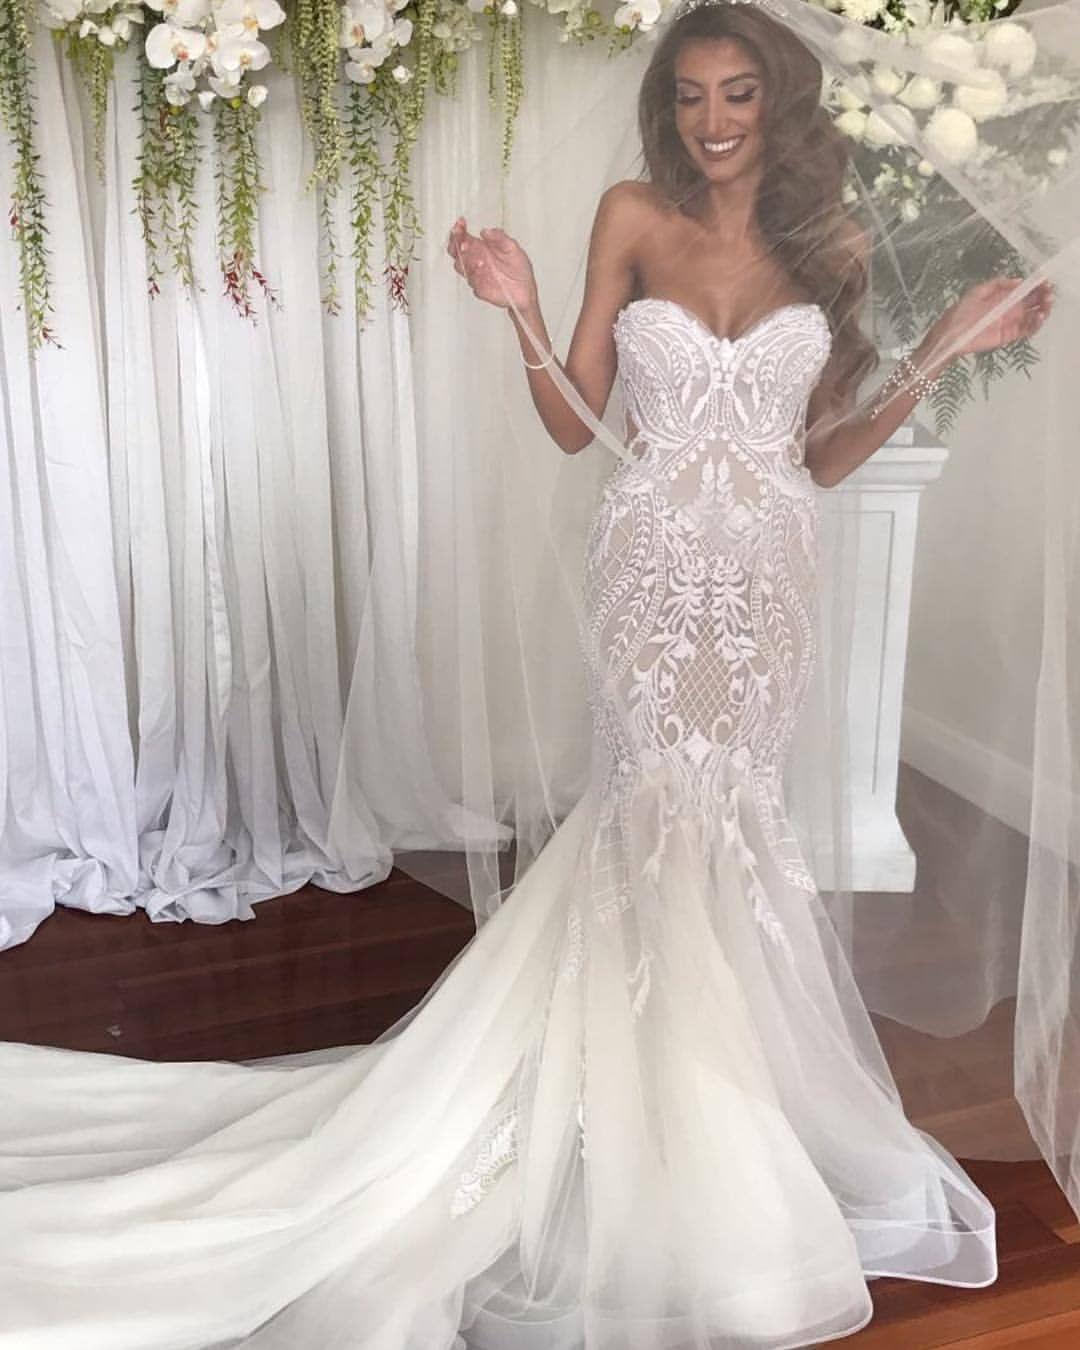 How Breathtaking Is This Beautiful Bride And That Perfect Smile Sparklingwhitesmile Transform Yo Wedding Gowns Mermaid Wedding Dresses Groom Wedding Dress [ 1350 x 1080 Pixel ]